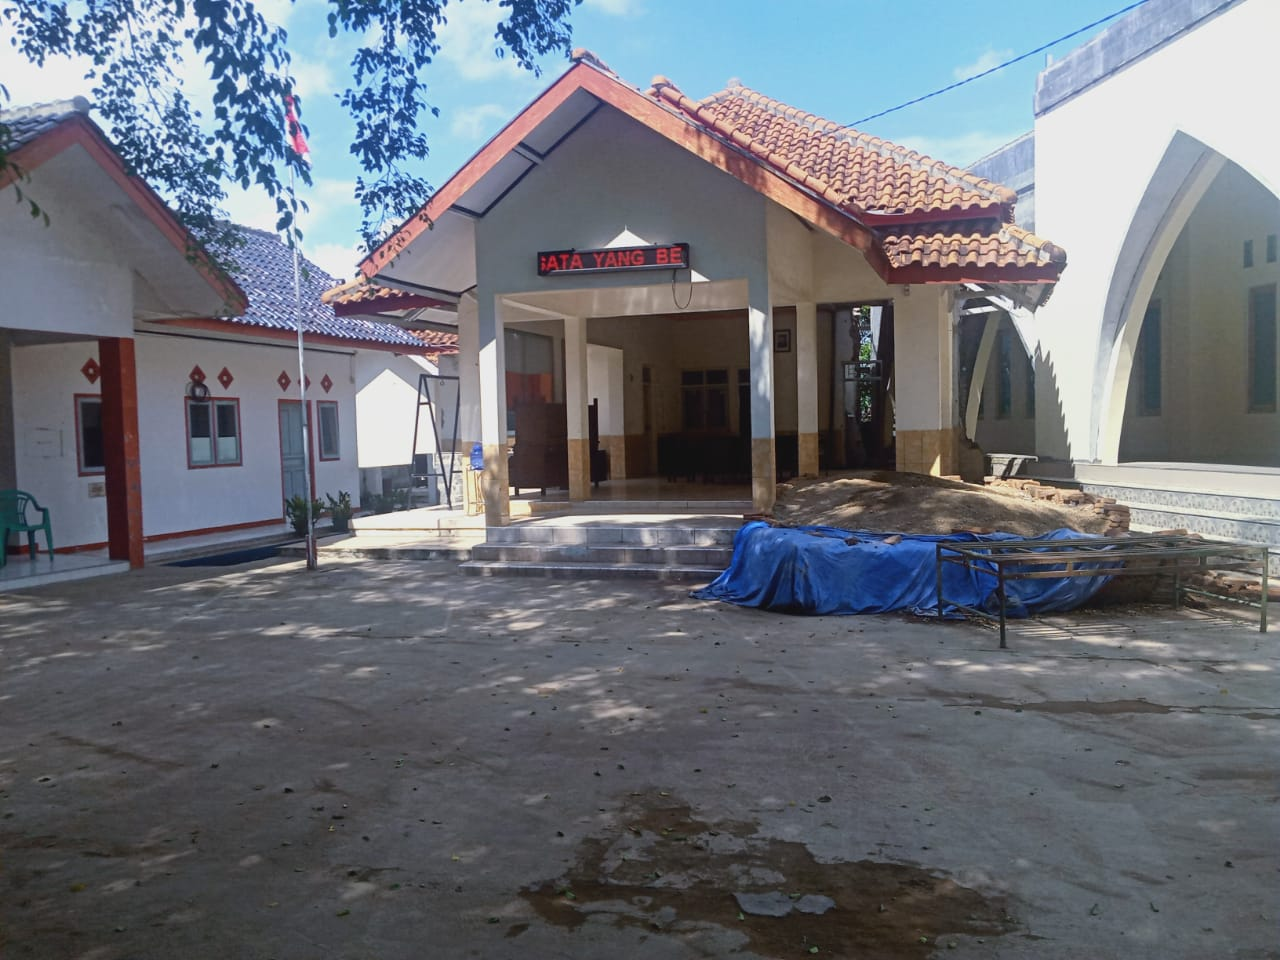 Kantor Desa Girimukti Kecamatan Kasoakandel Kabupaten  Majalengka